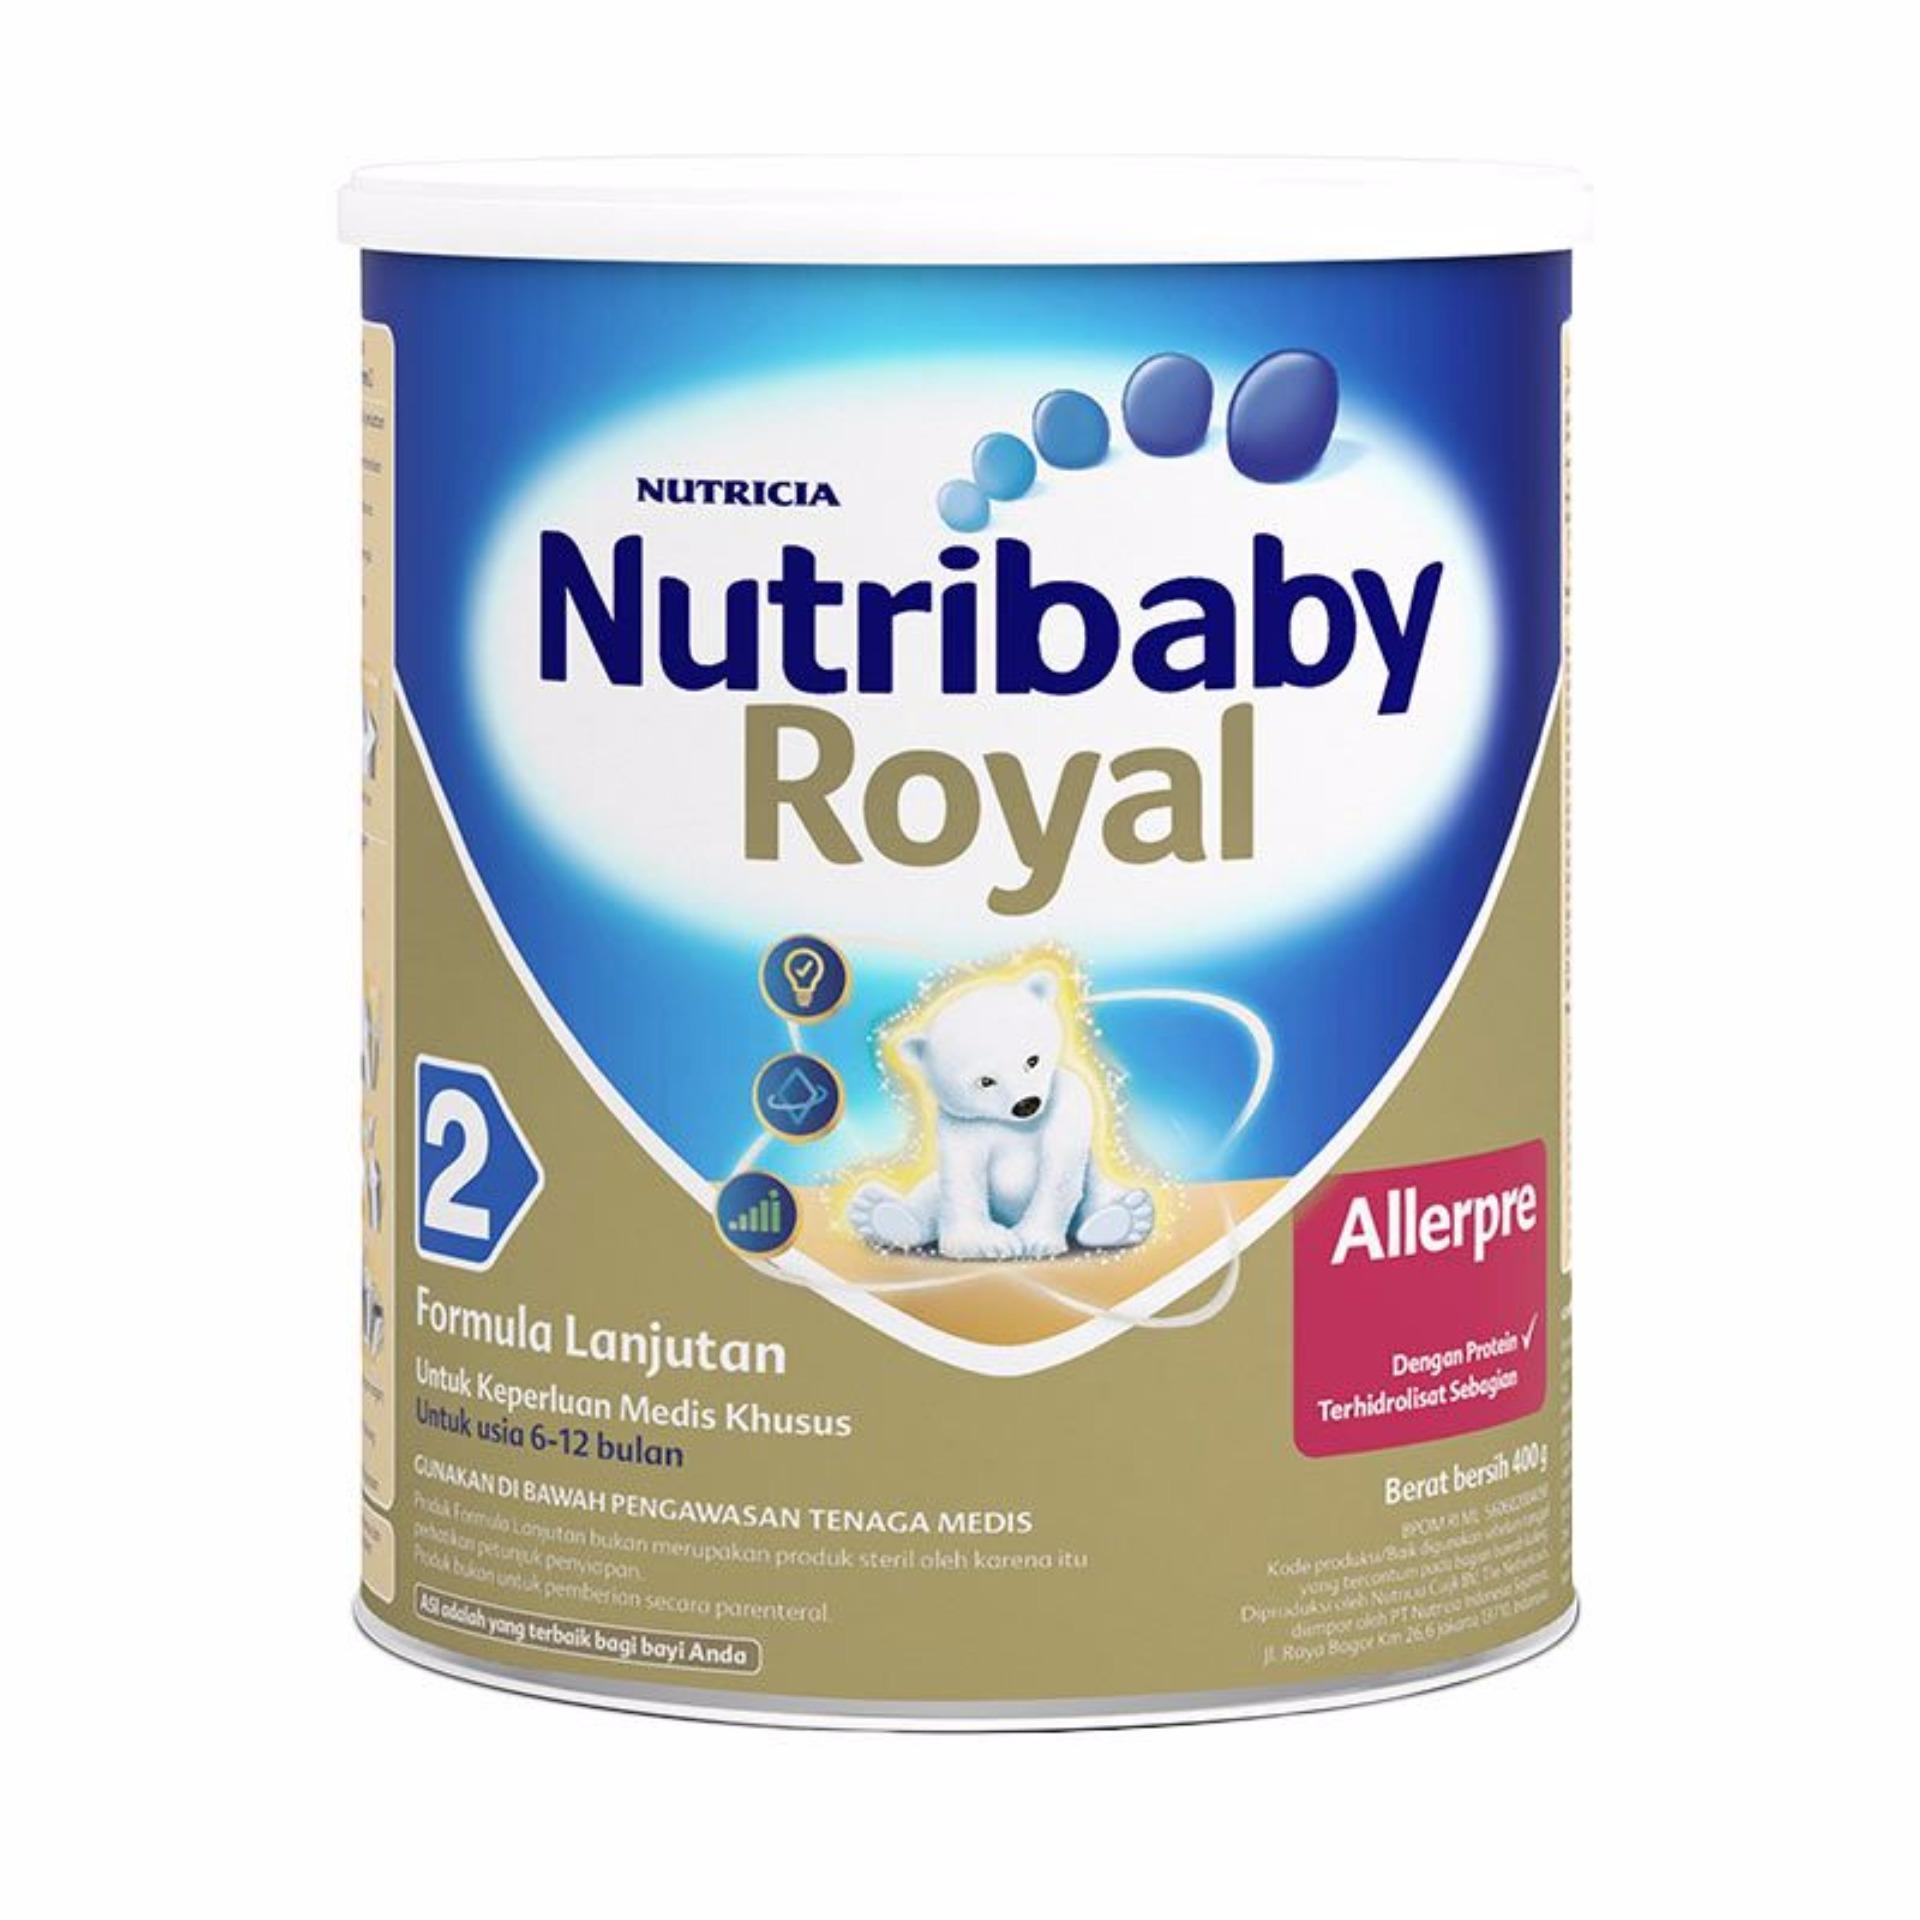 Jual Susu Formula Nutricia Termurah Bebelac 4 Vanilla Madu 400gr Nutribaby Royal Allerpre 2 400 Gr